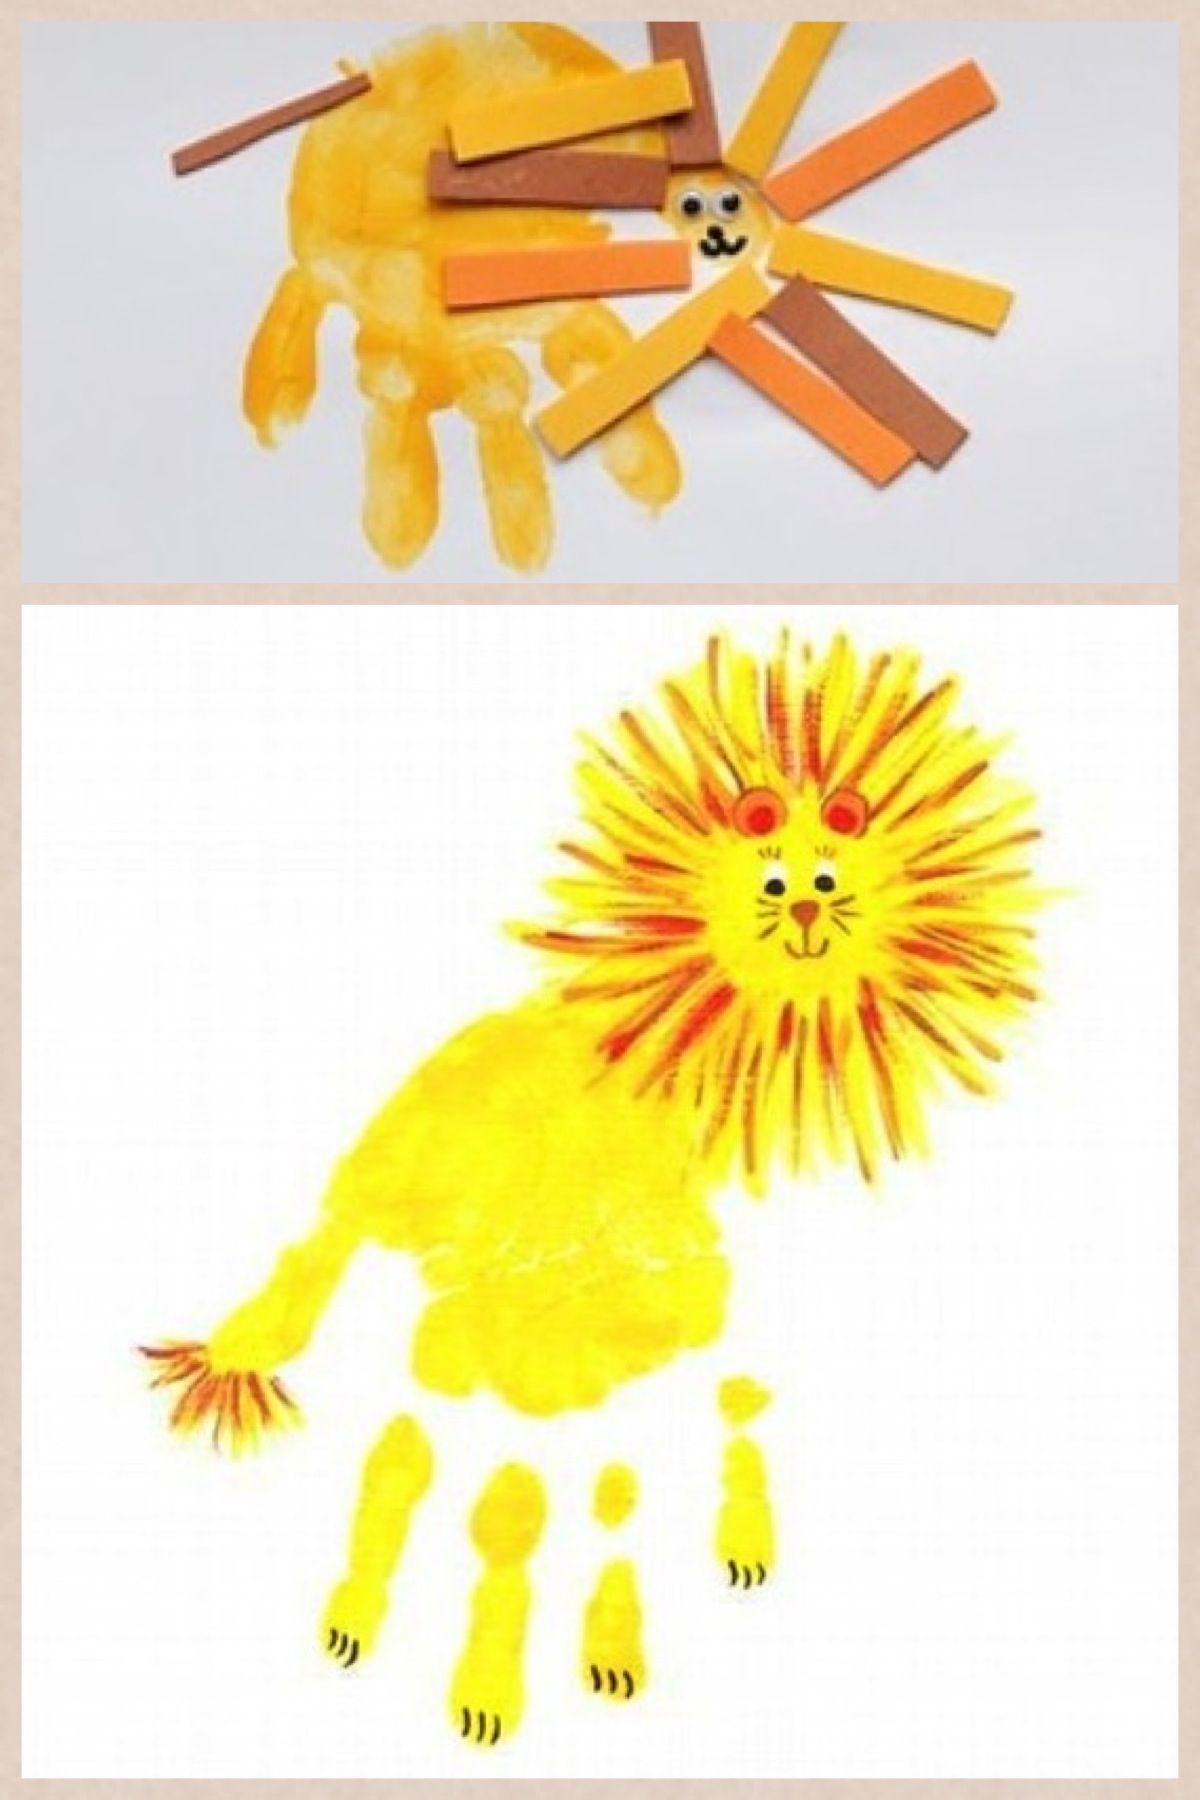 Handprint Lion >> Larry Lion Handprint Craft Ll Crafts To Do With Kids Crafts